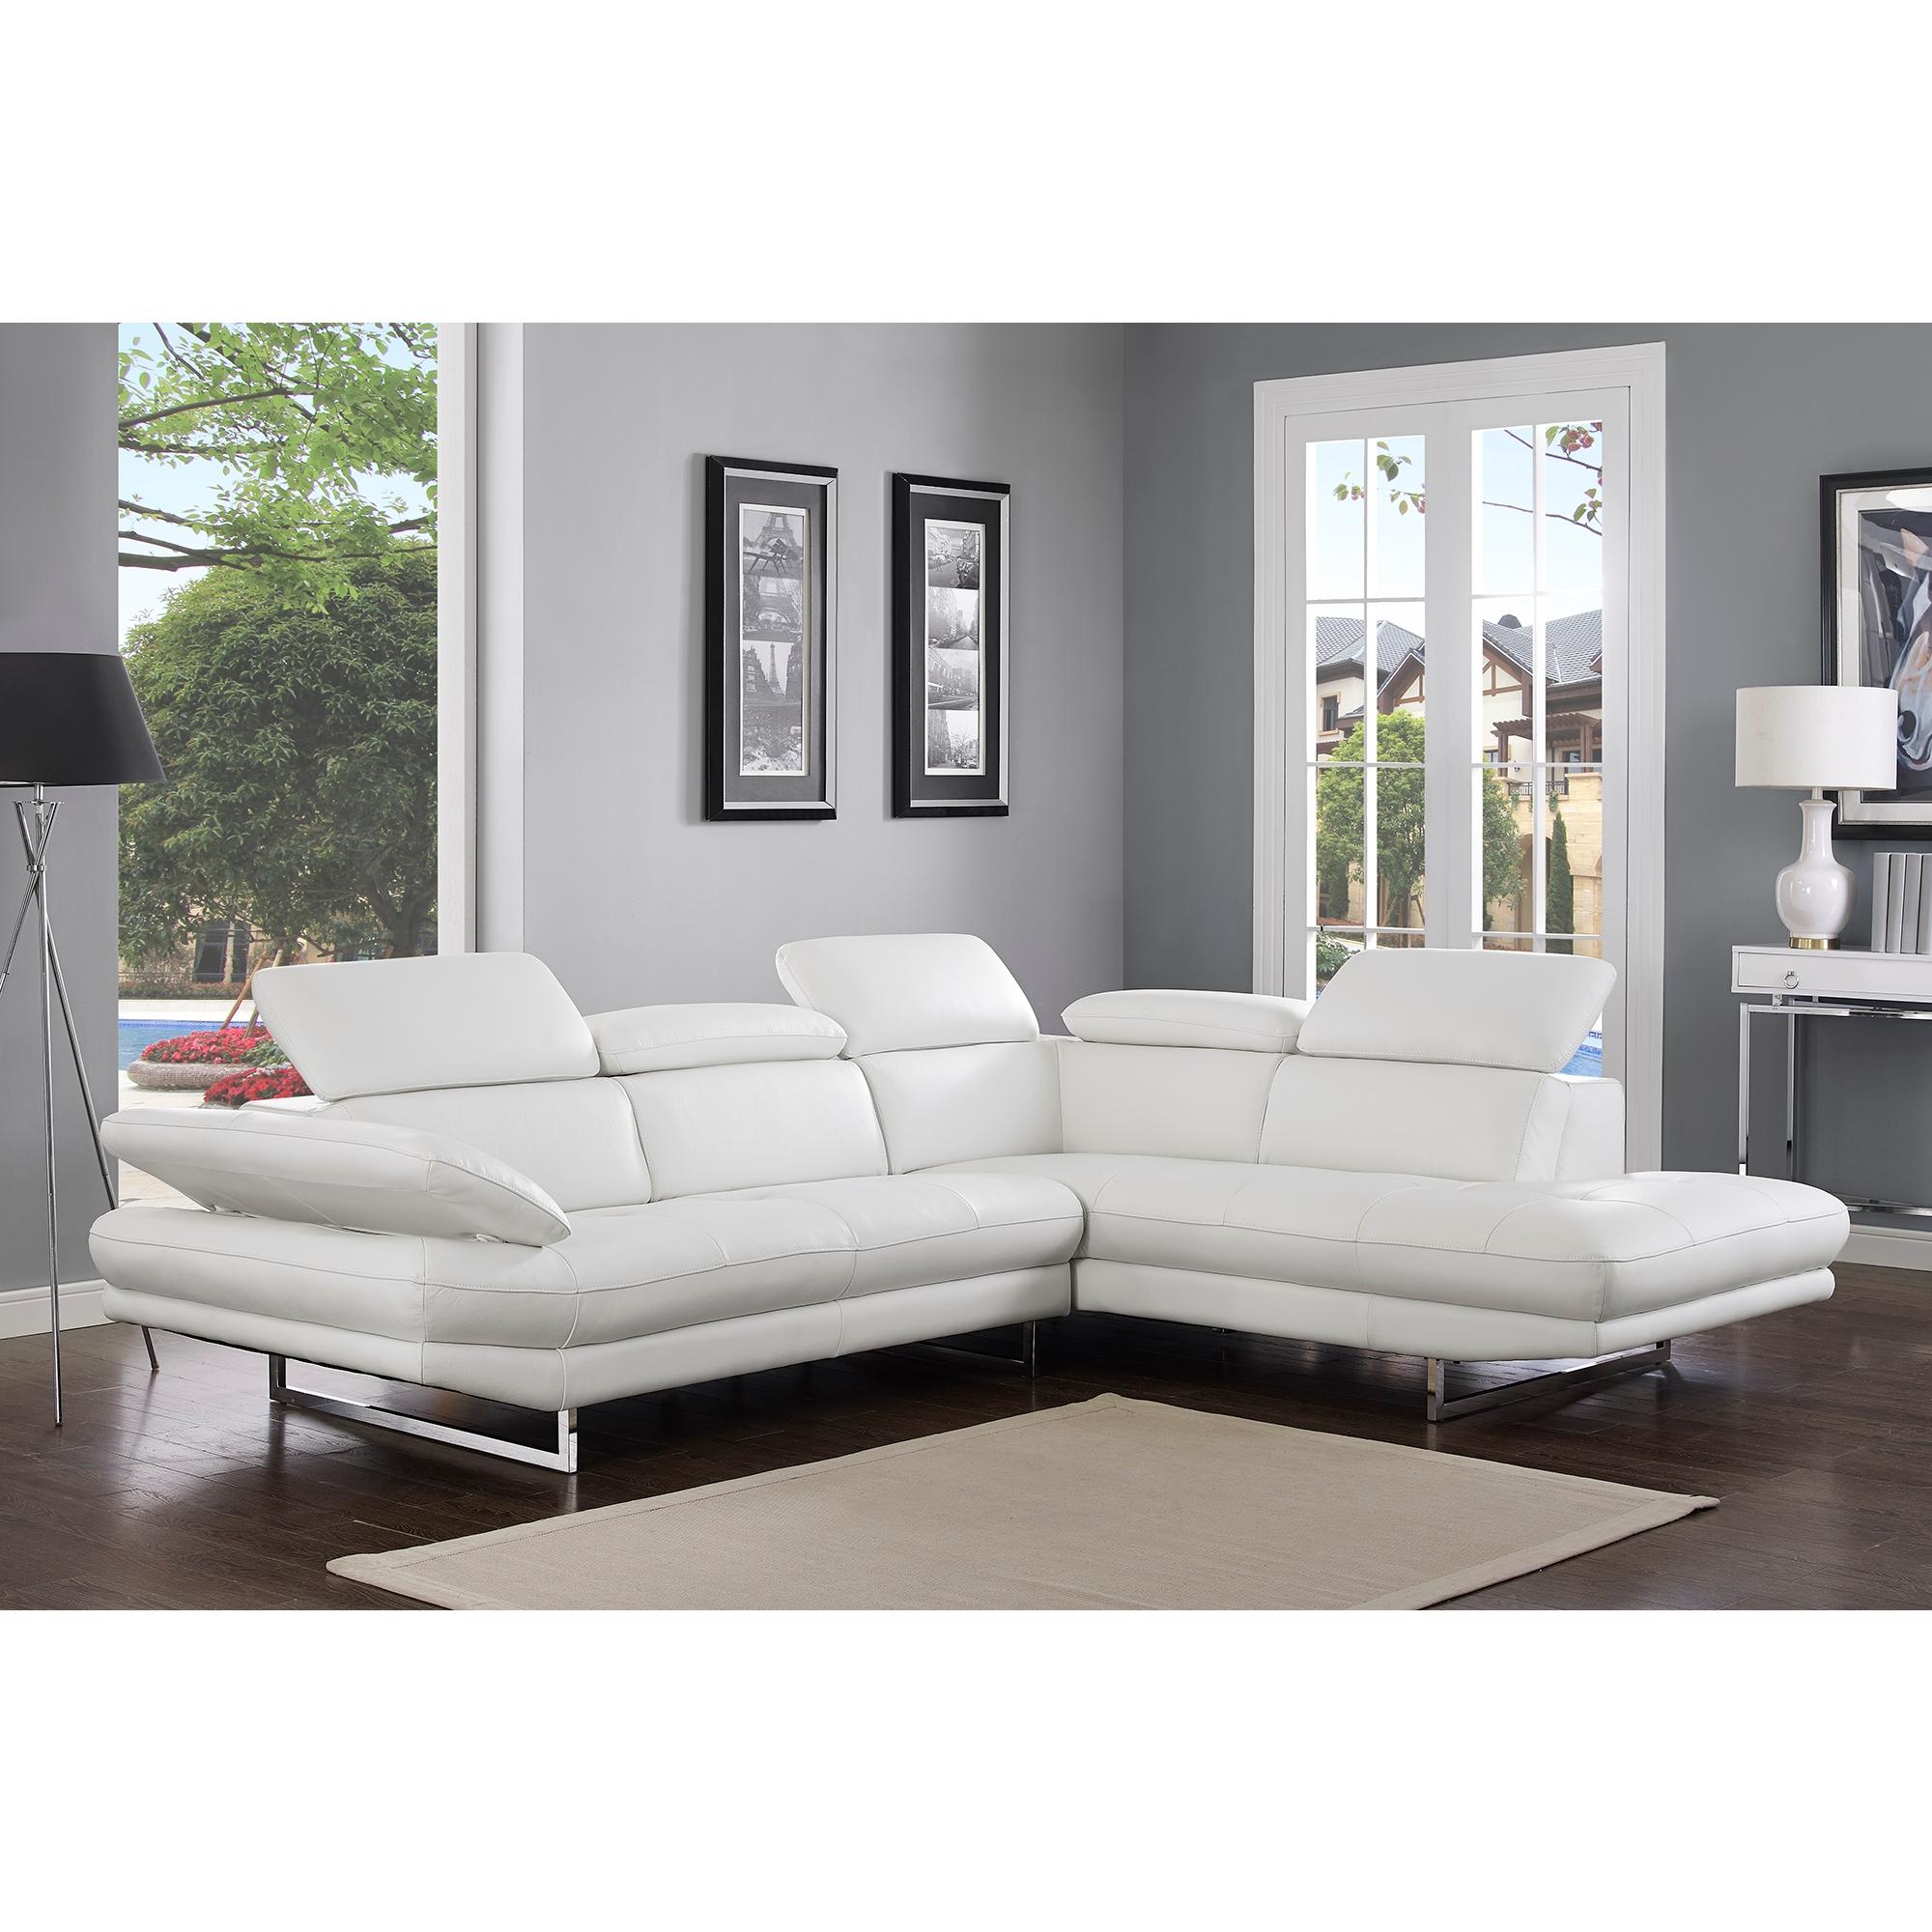 Whiteline Imports SR1351L WHT Pandora Sectional Sofa w Chaise on